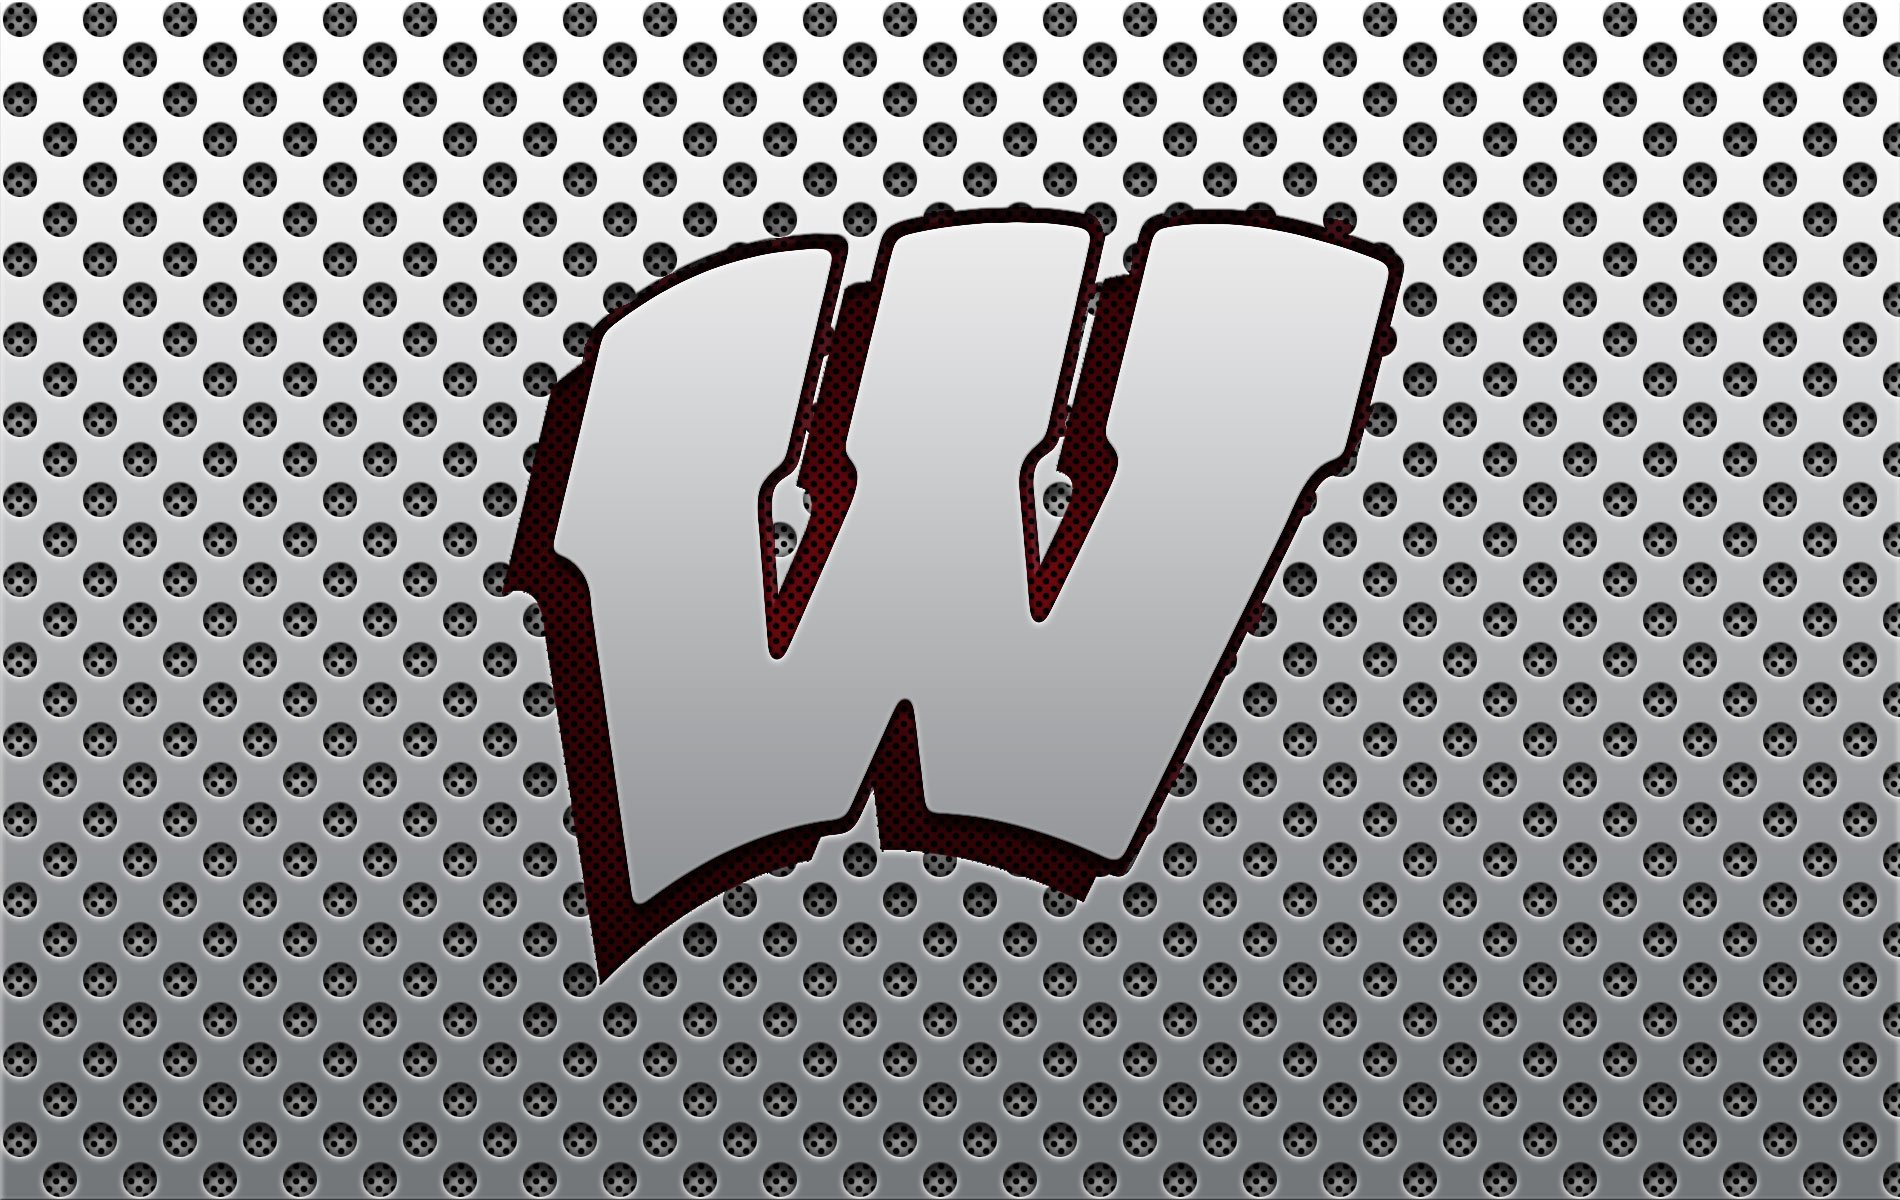 Green Bay Packers Wallpaper Hd Wisconsin Badgers College Football Wallpaper 1900x1200